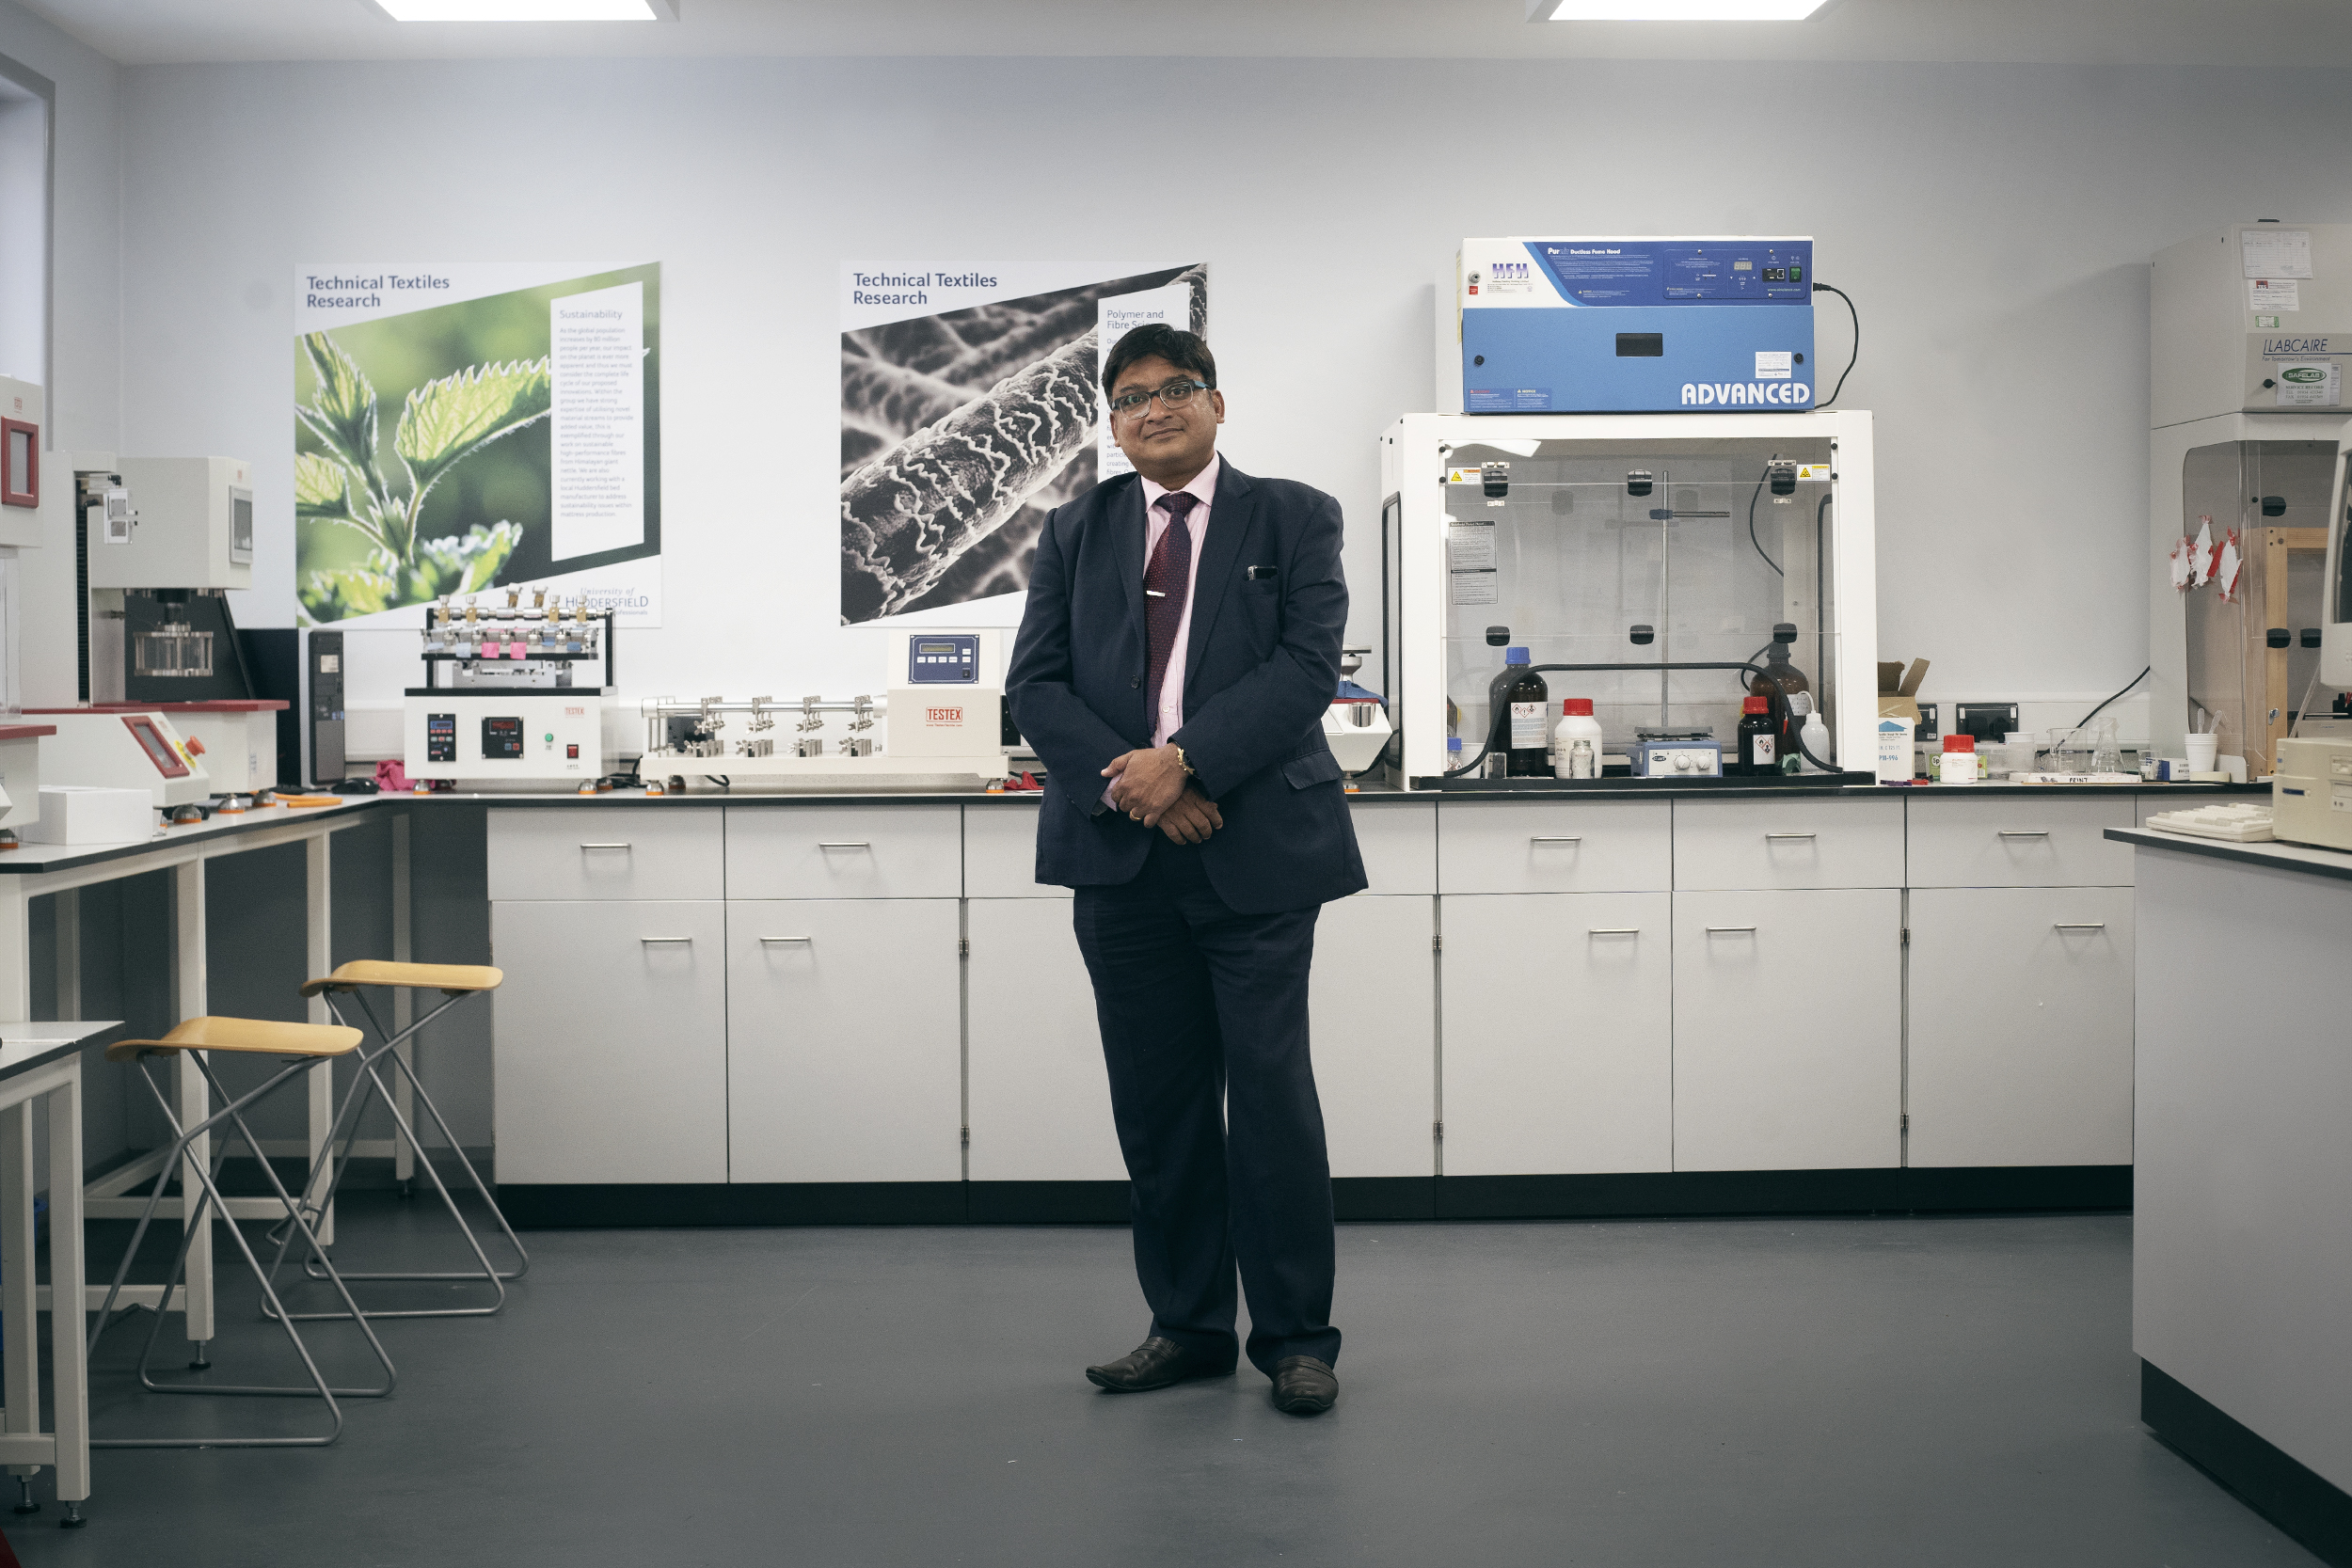 Parik Goswami in the technical textiles lab.